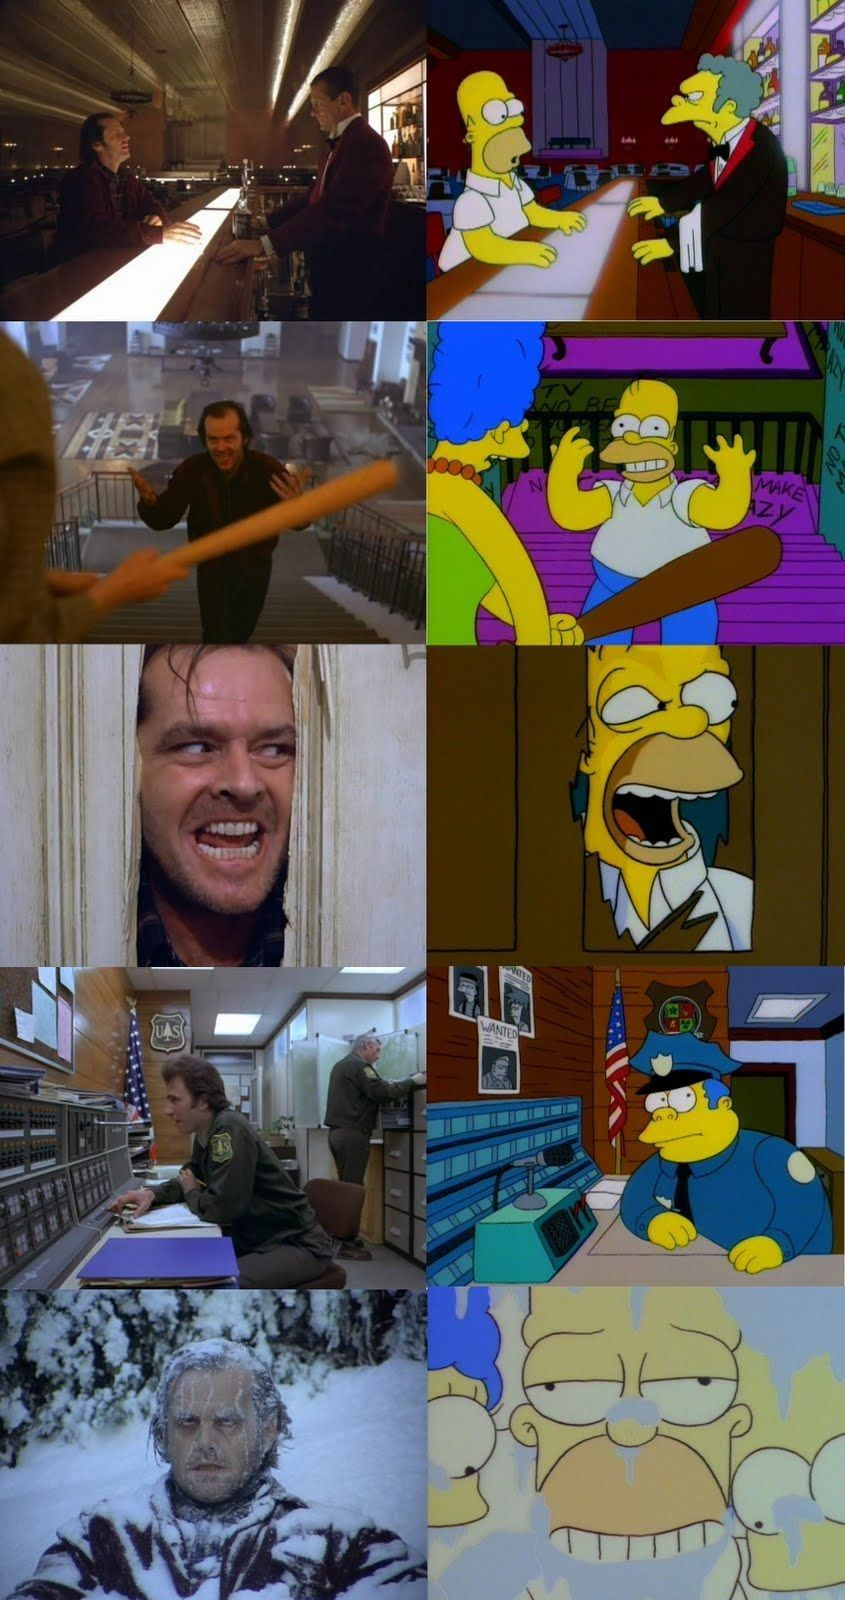 The Simpsons • Treehouse of Horror Imágenes de los